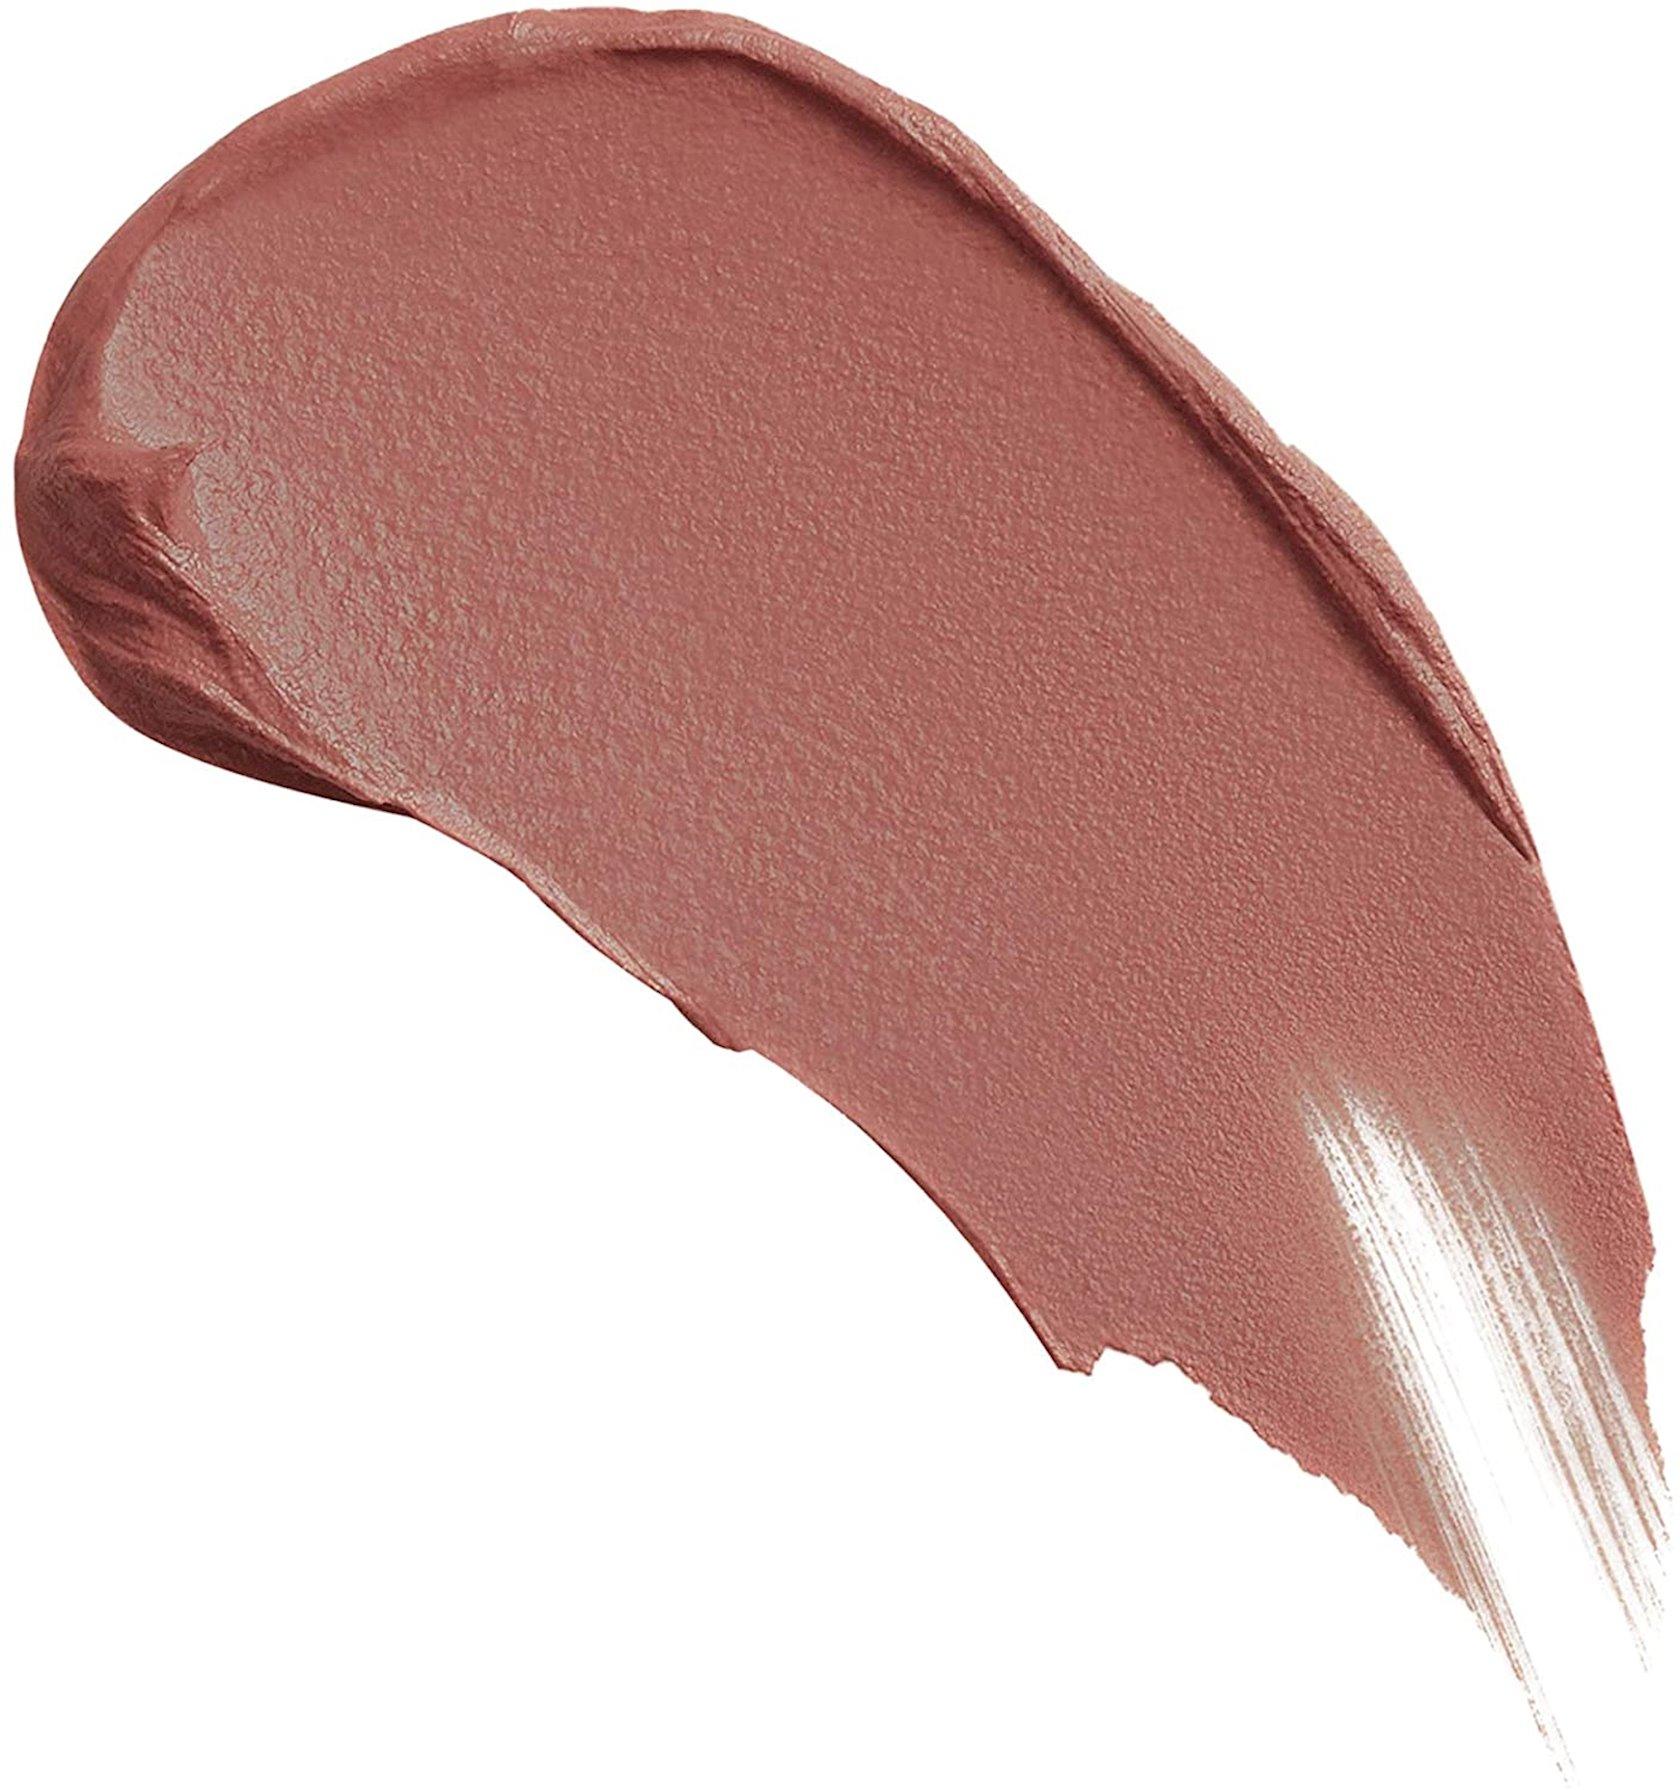 Maye pomada Max Factor Lipfinity Velvet Matte Lipstick 080 Rose Couture